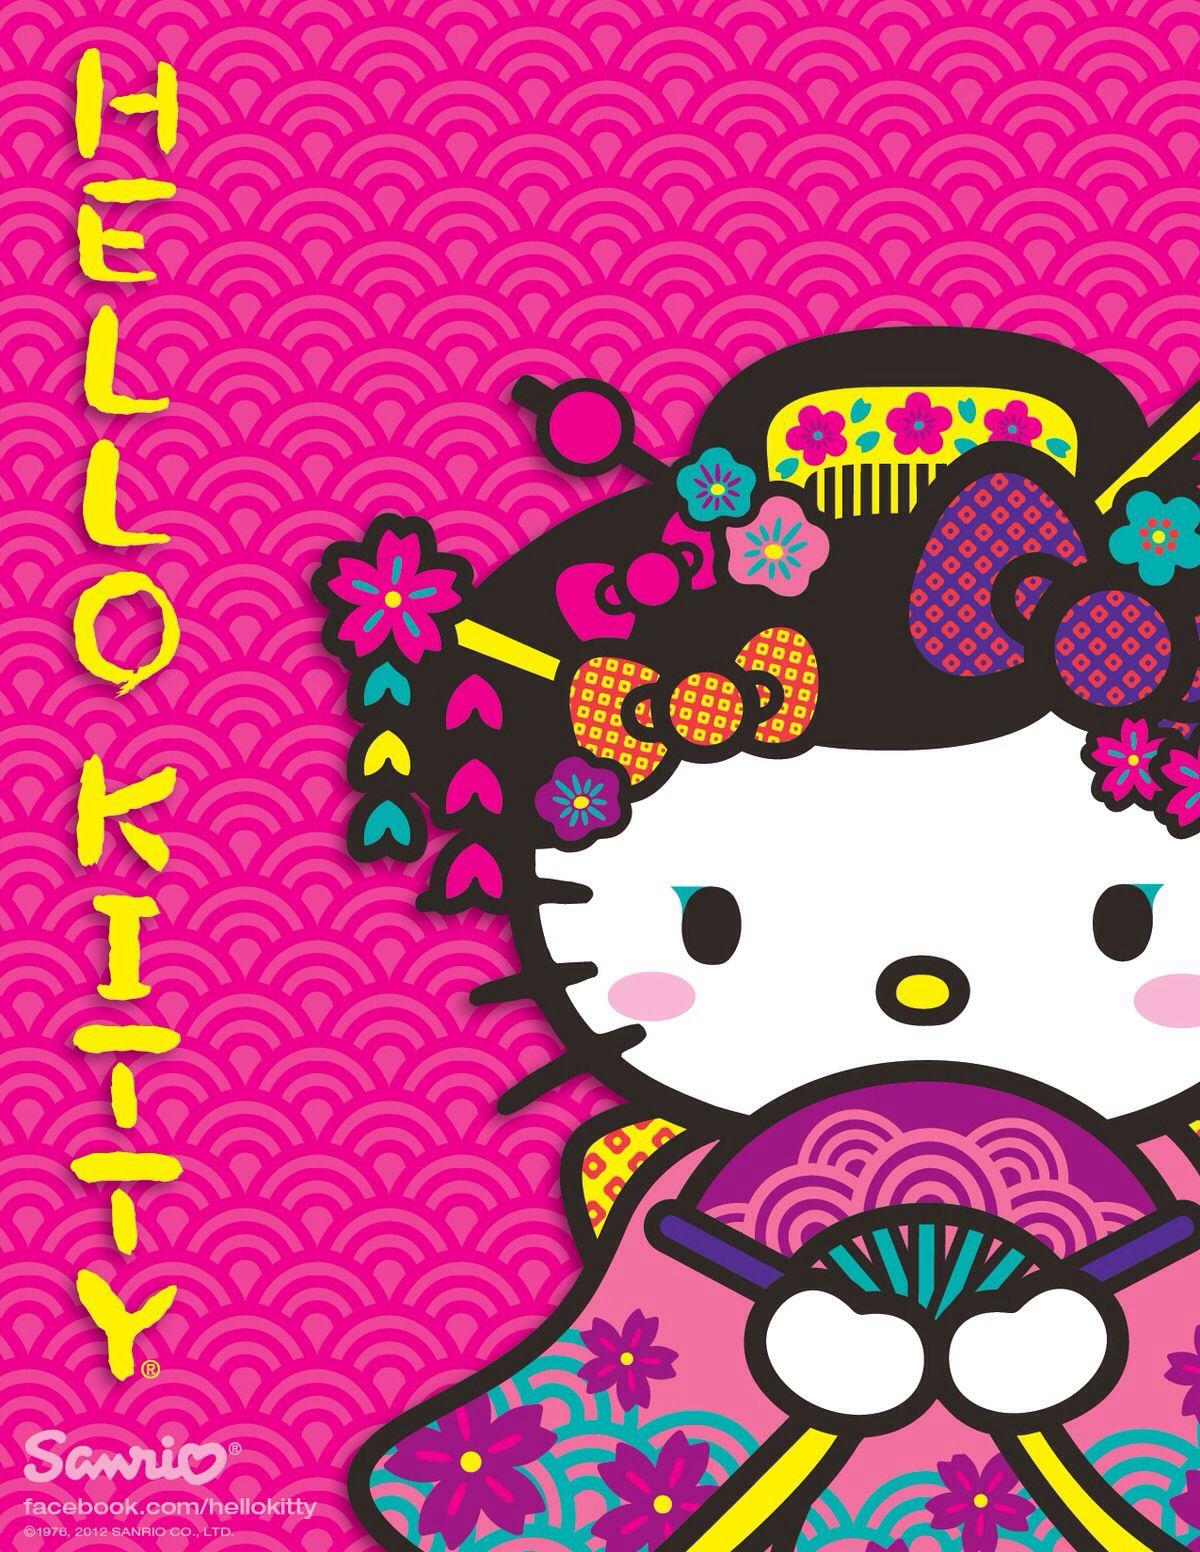 Fantastic Wallpaper Hello Kitty Cute - 83b47c091dd4d03bfb23688622aa4391  Picture_289864.jpg